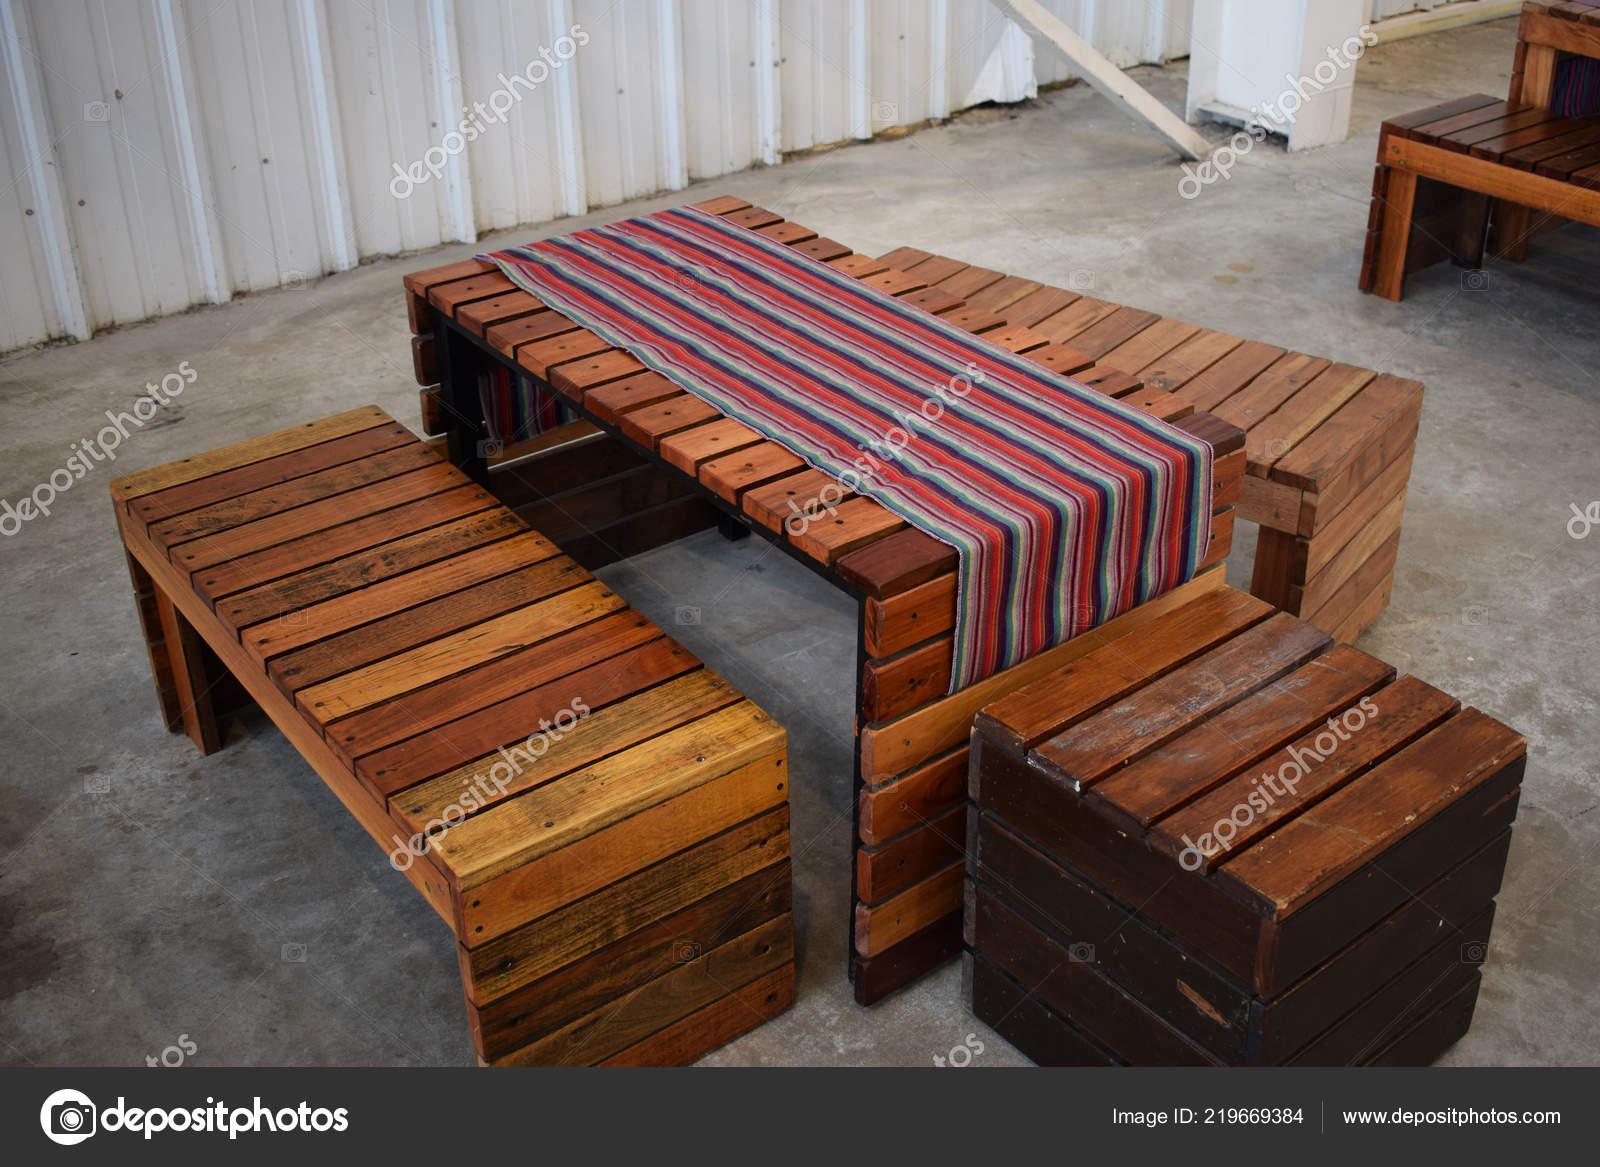 Wooden Bench Table Street Restaurant Stock Photo C Yofoto 219669384